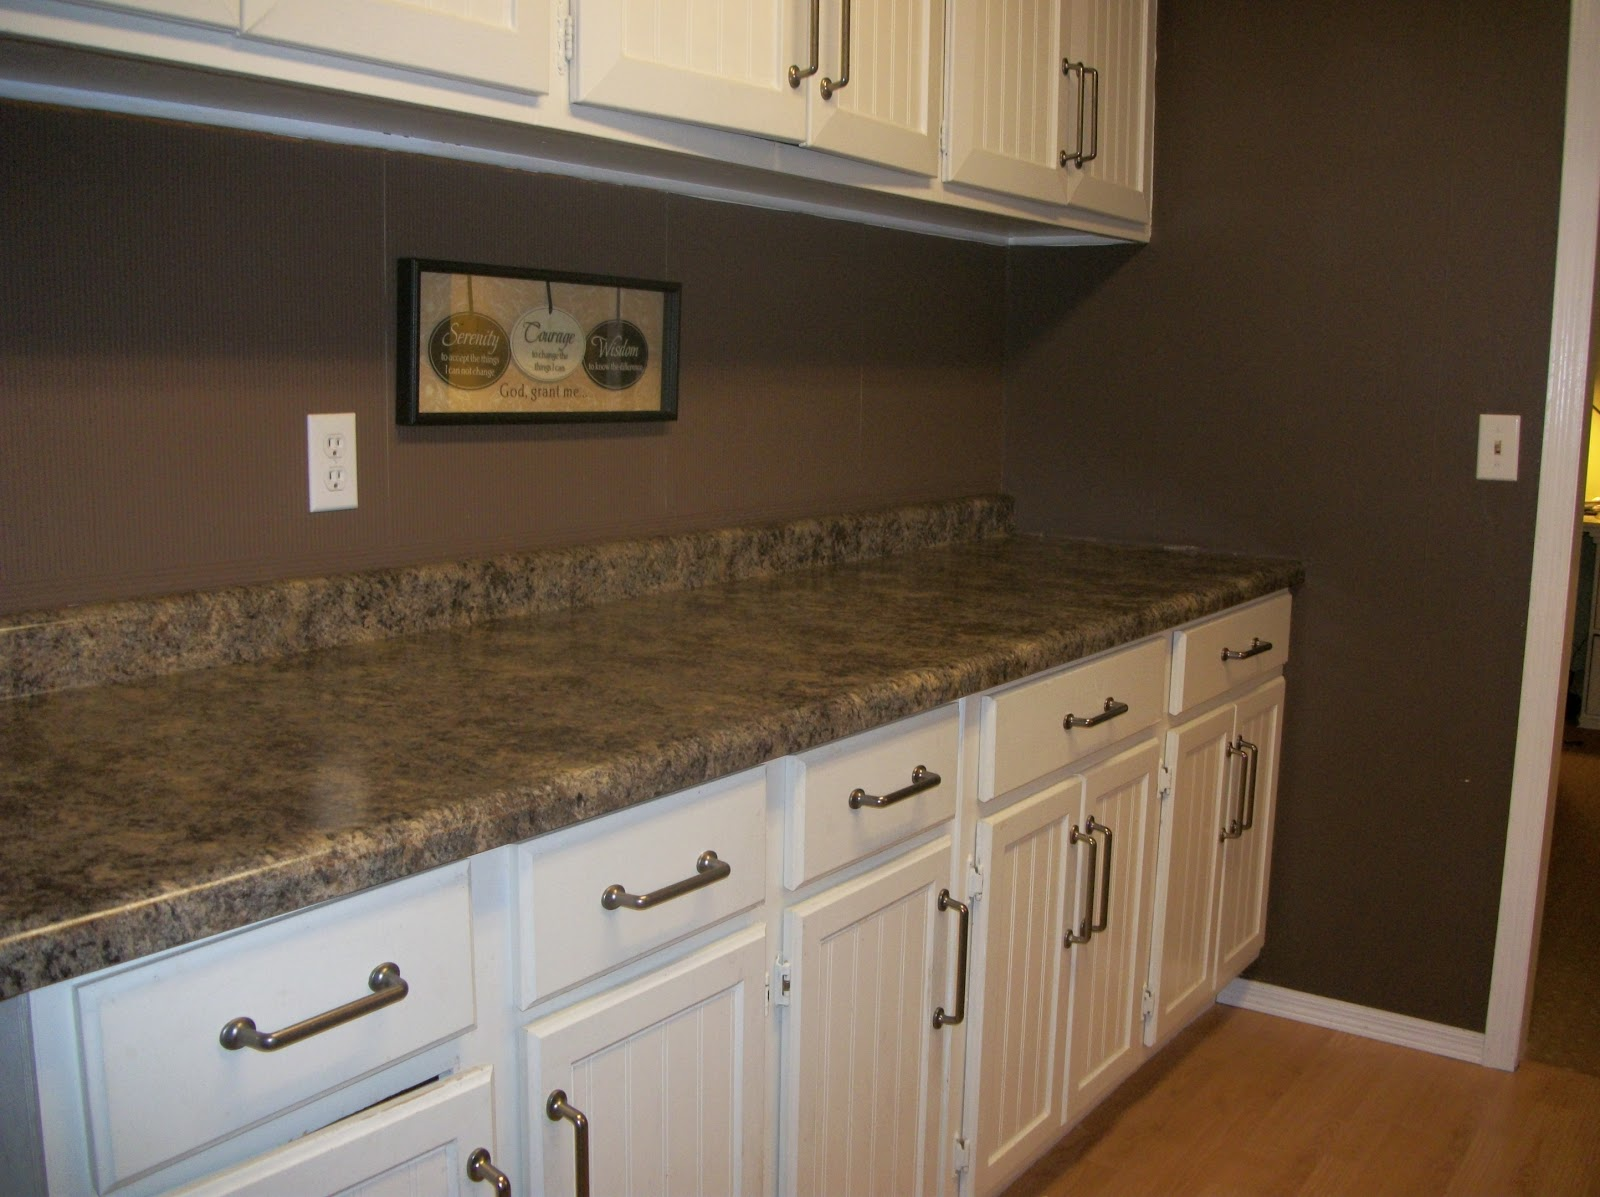 Menards Kitchen Backsplash Storage Wall Units Bella Maria Mom New Countertops Peek